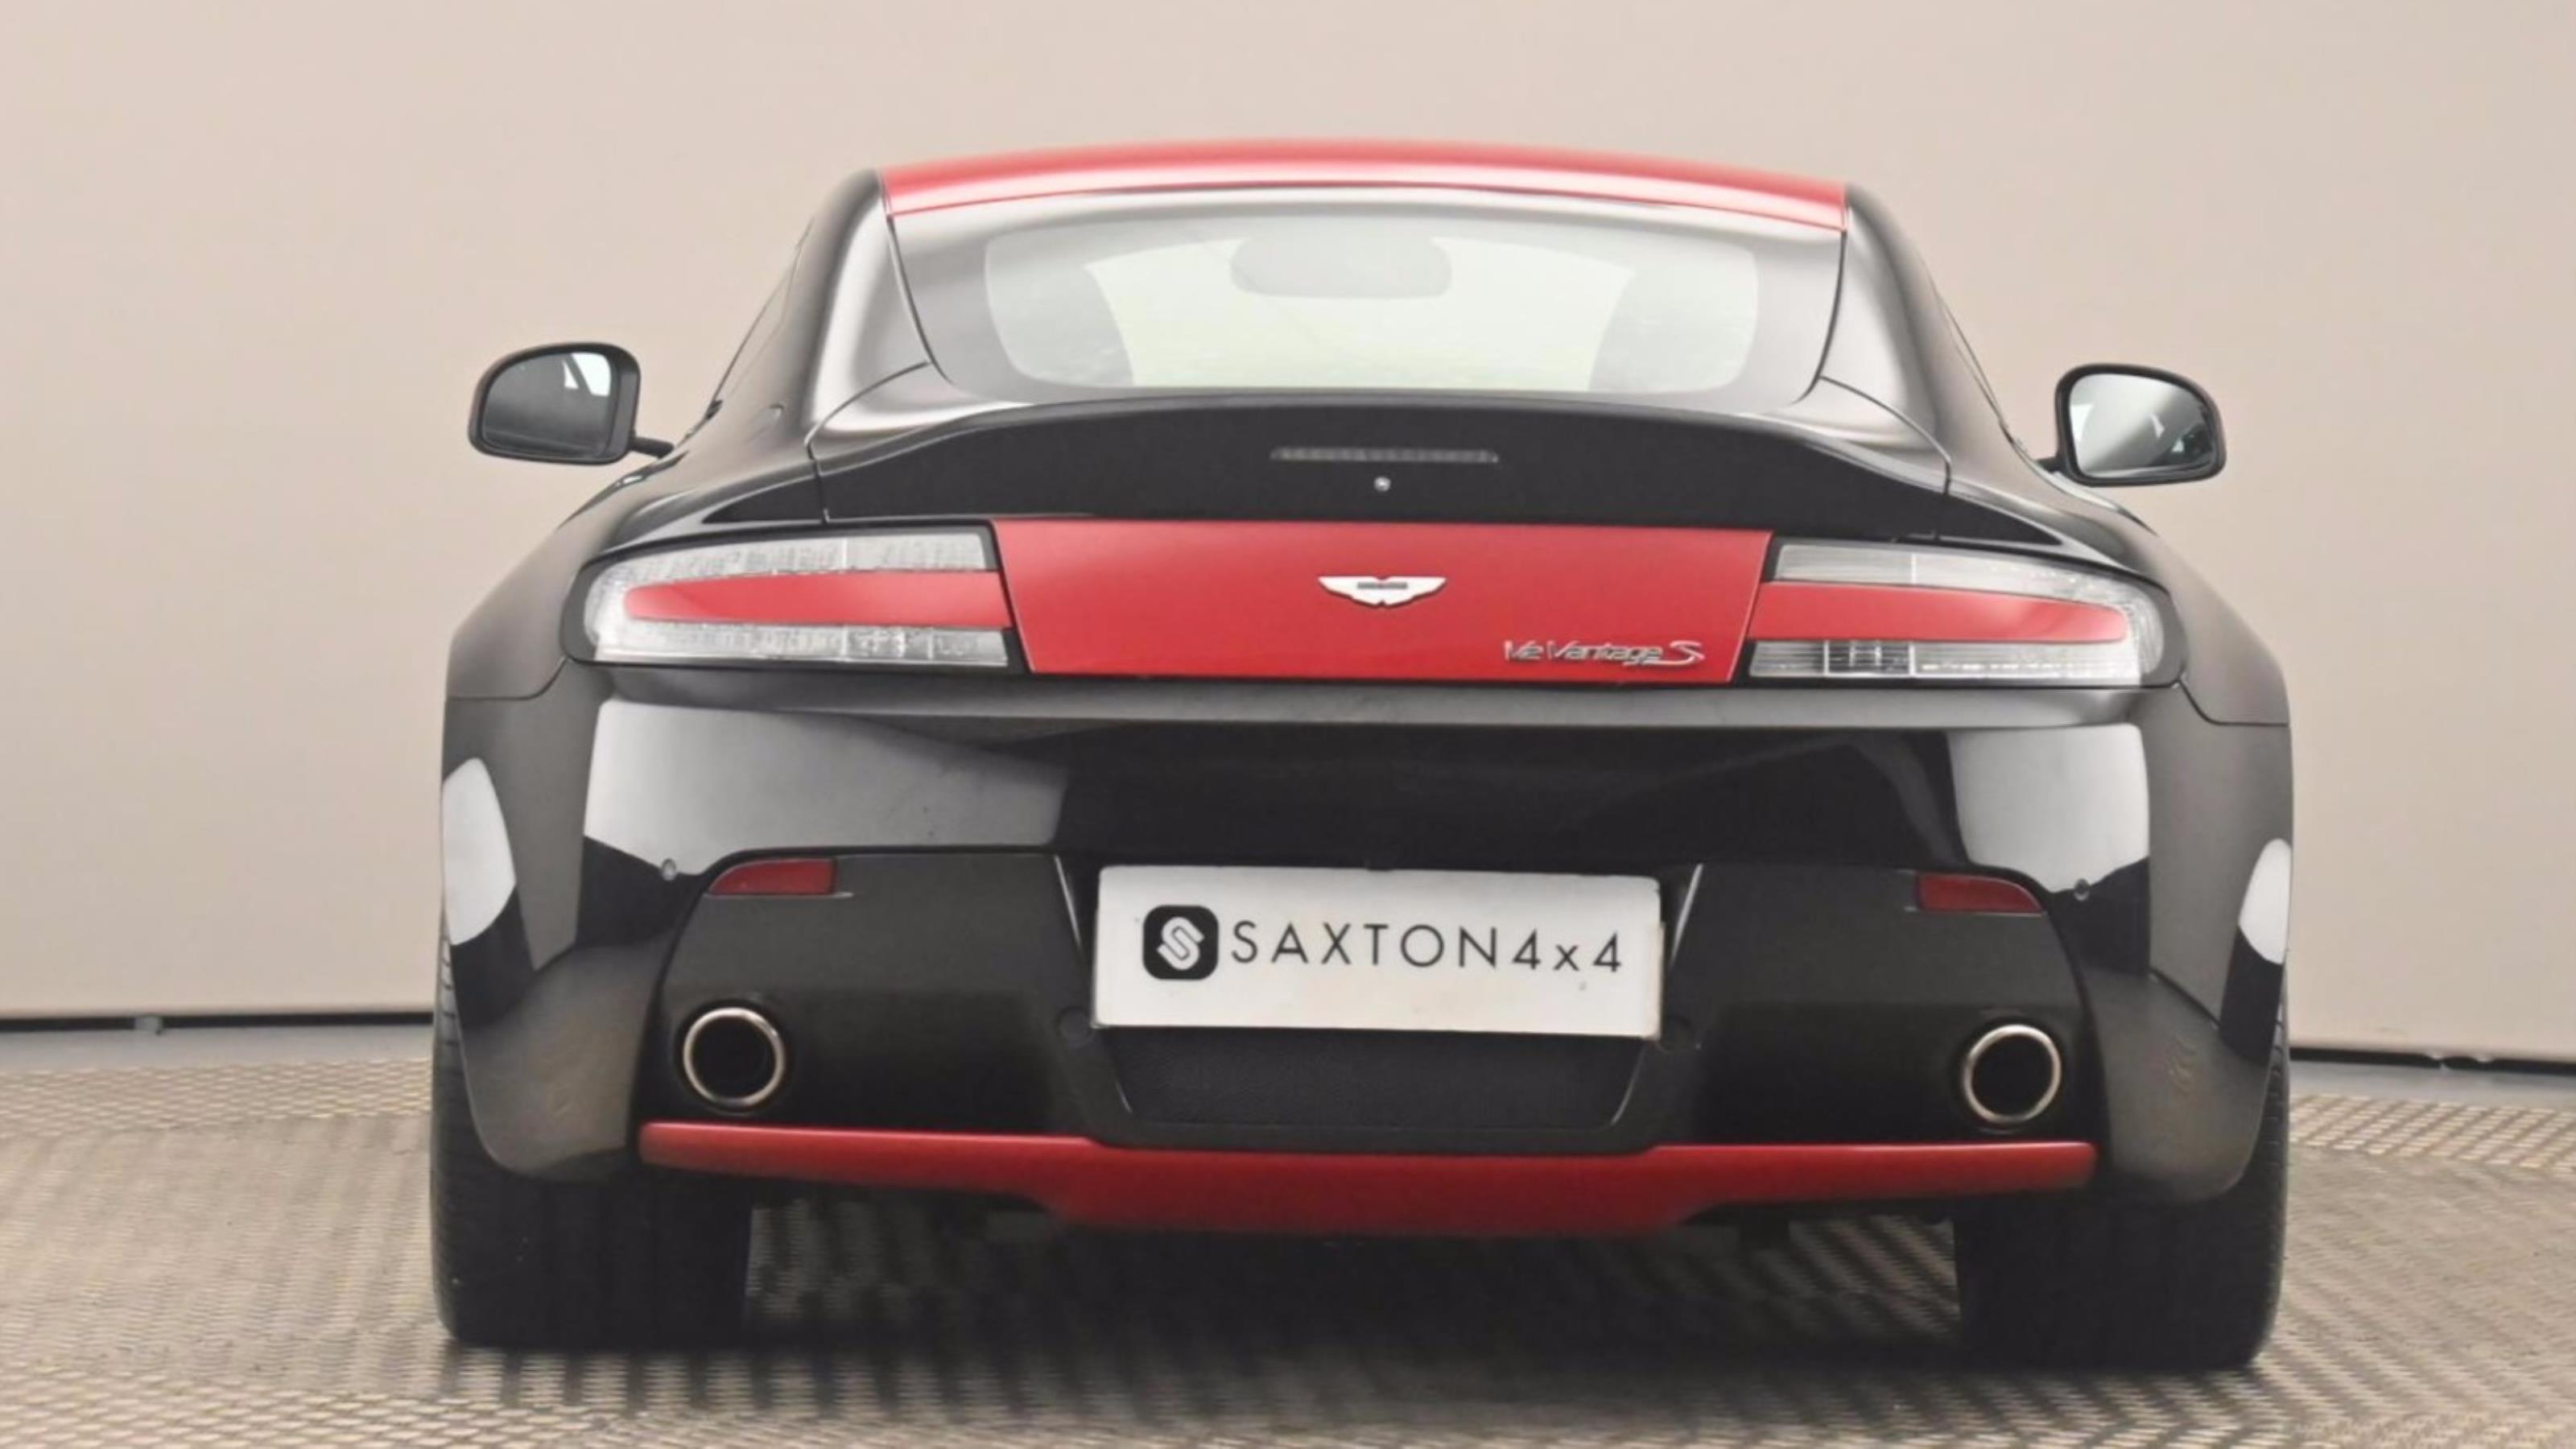 Used 2014 Aston Martin VANTAGE S 2dr Sportshift III Black at Saxton4x4